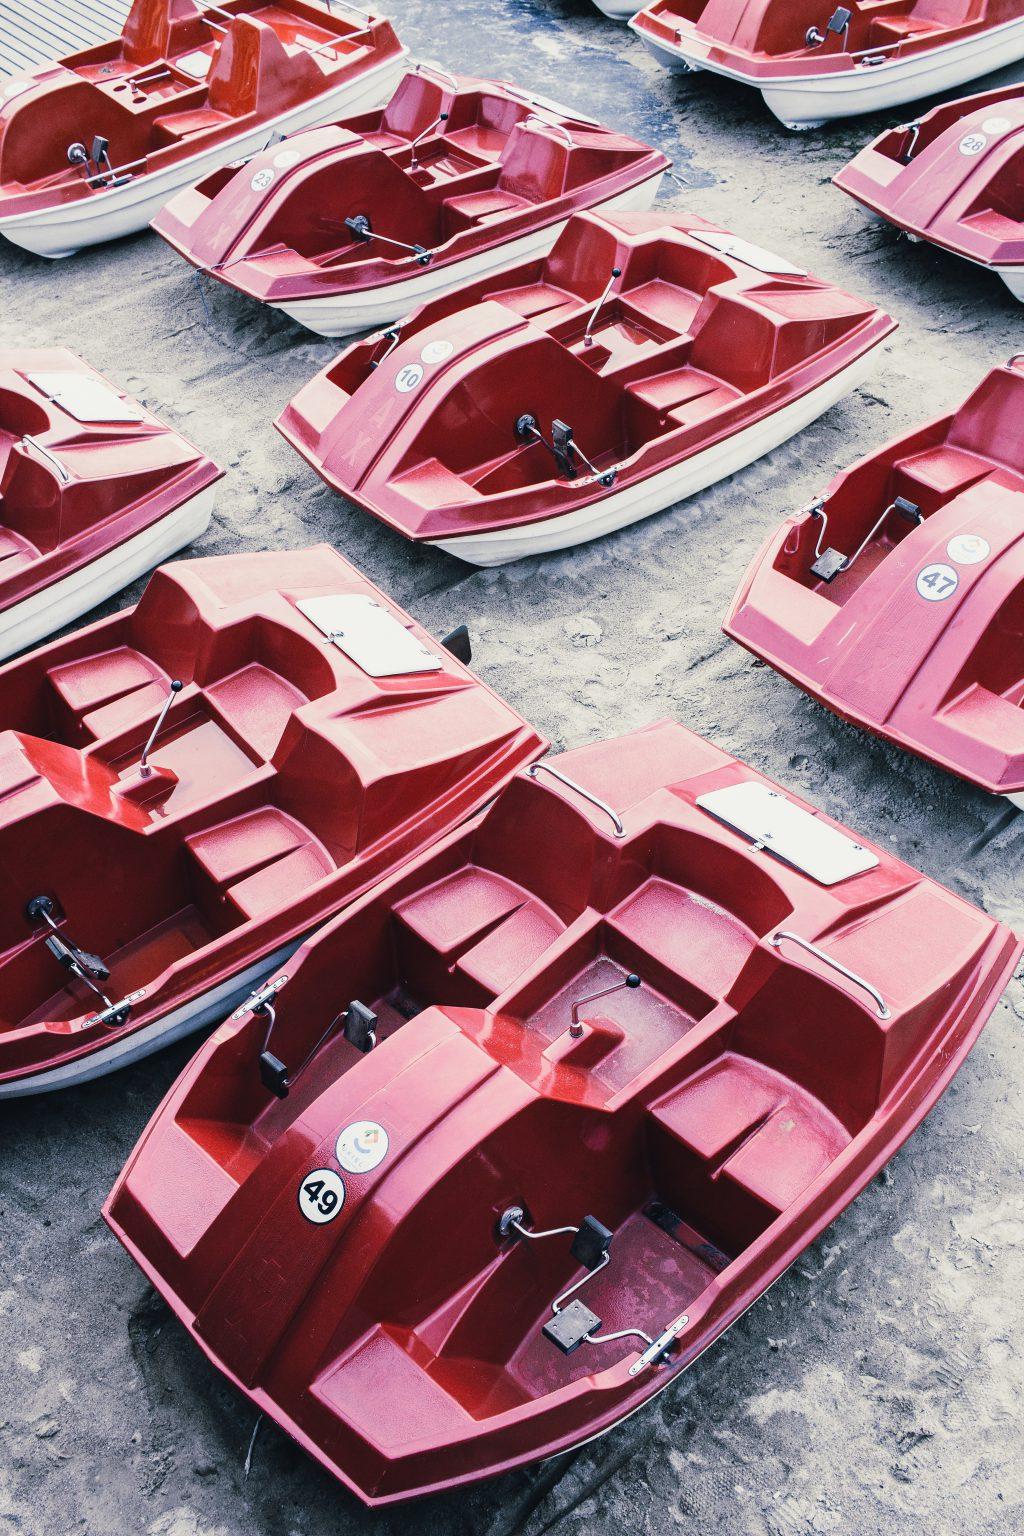 Paddle boats - free stock photo